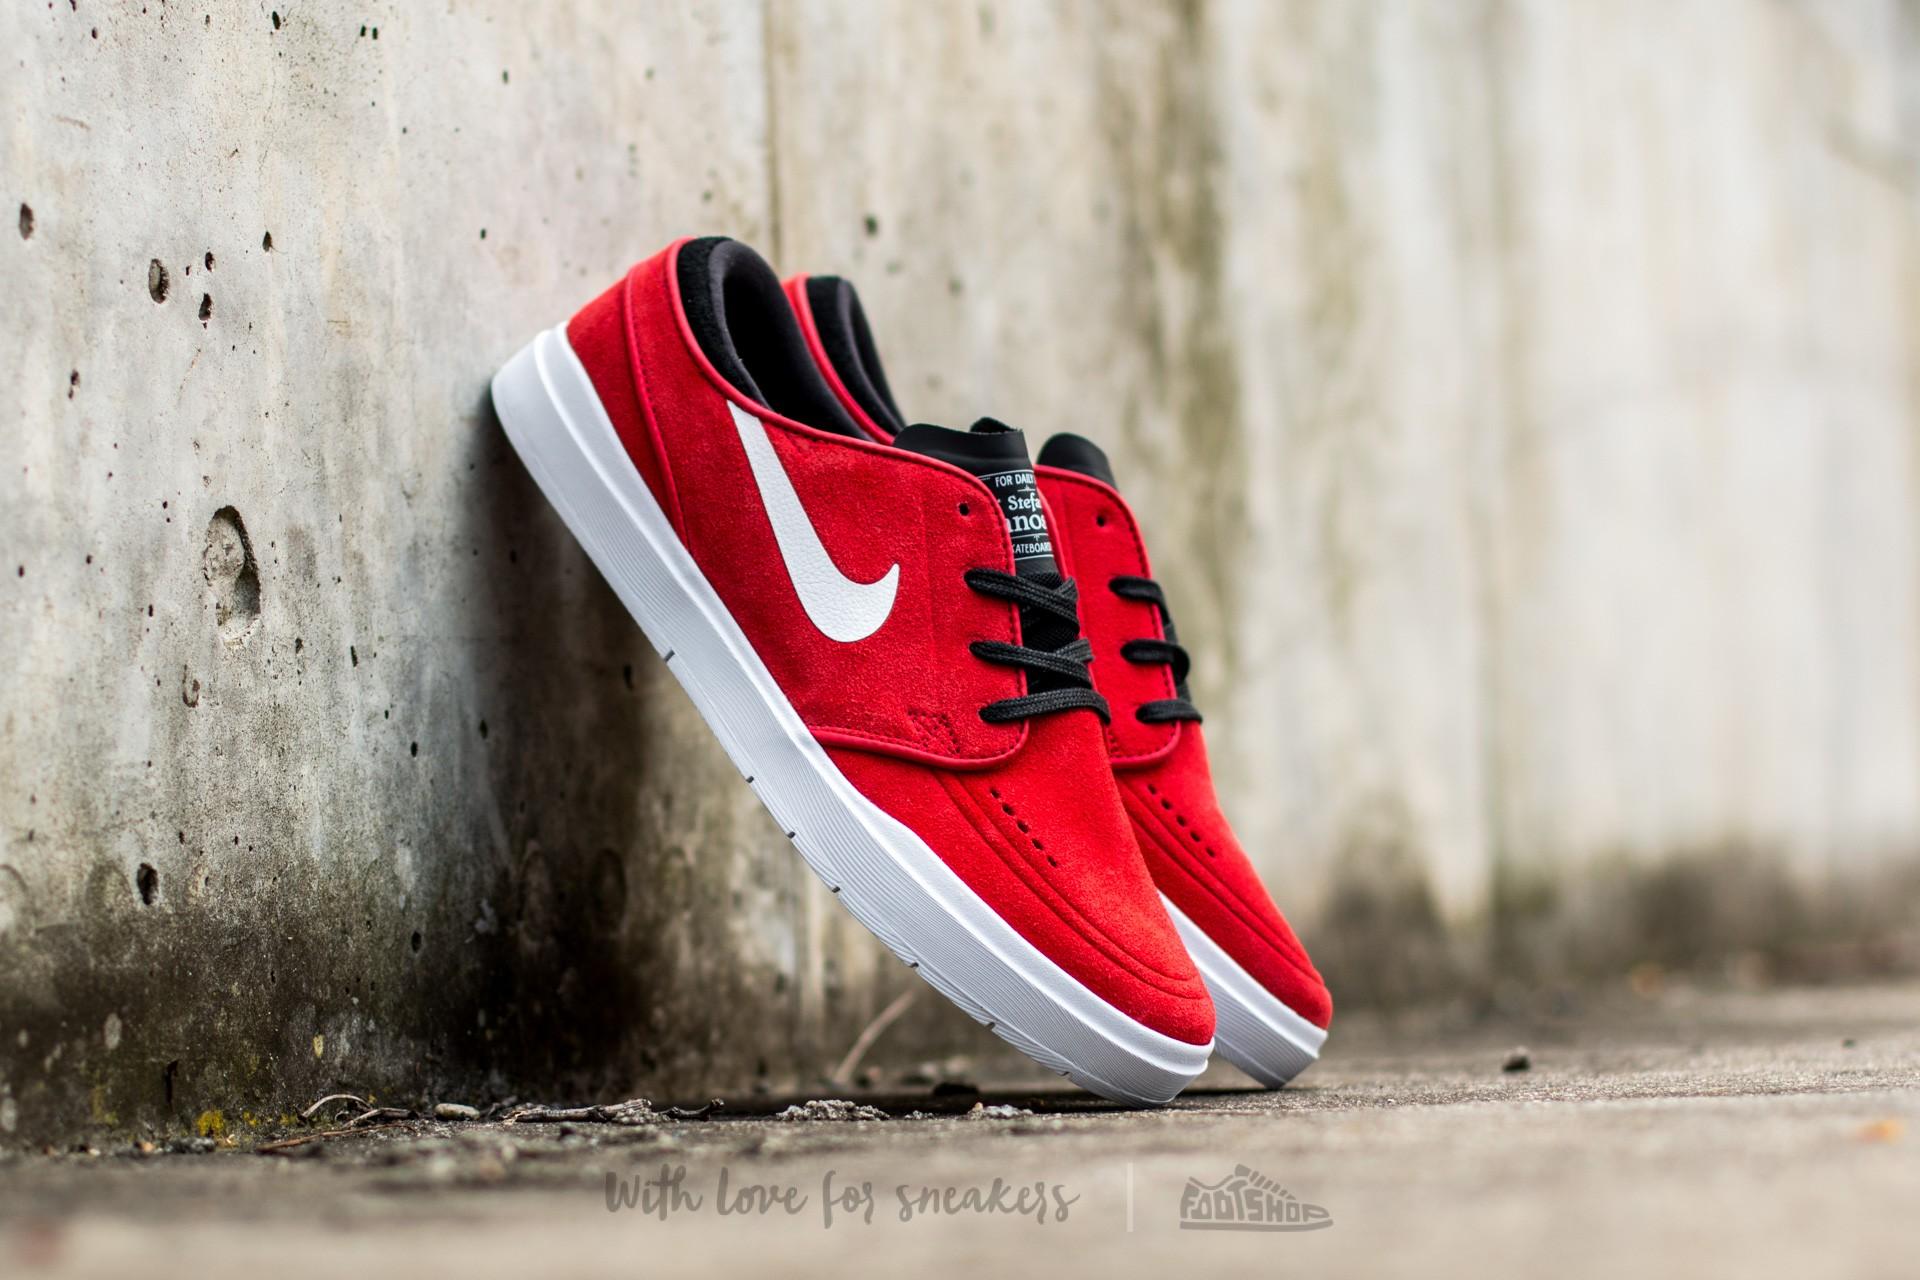 f975e838a34d Nike Stefan Janoski Hyperfeel University Red  White-Black-Total Crimson